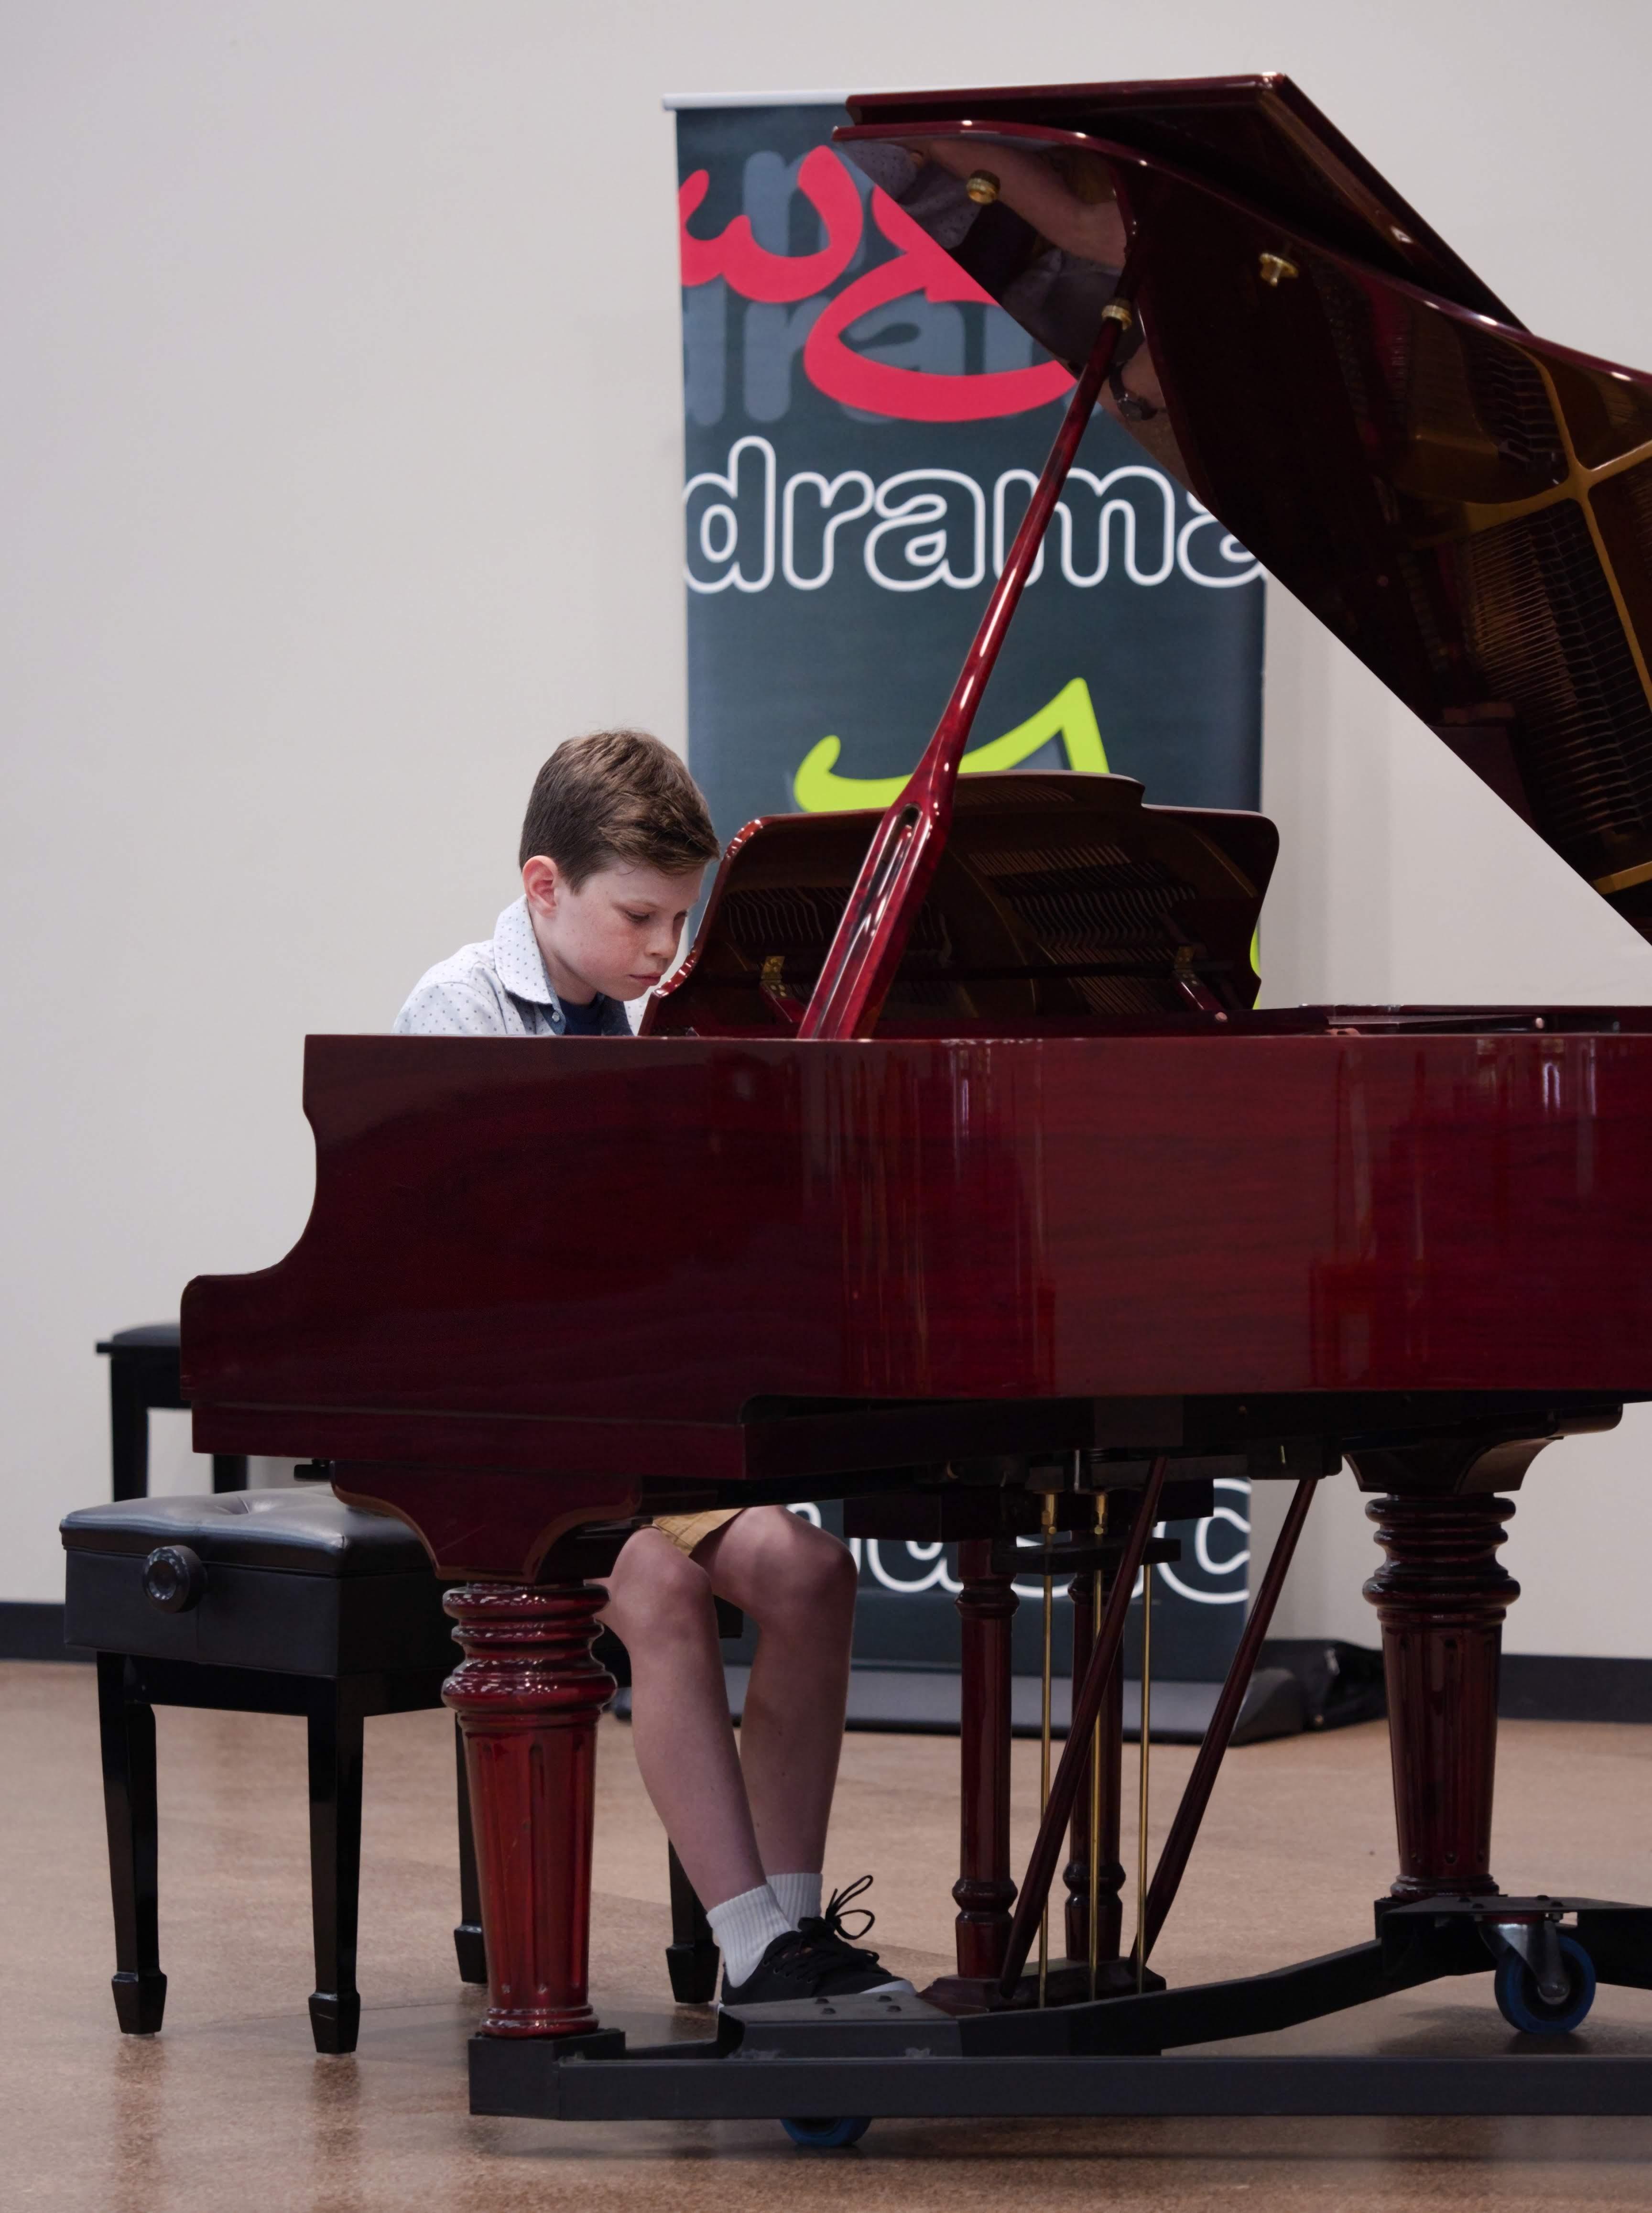 WGE Pianoforte Day 2 Patrick Wilson Displays his Skills on the Piano